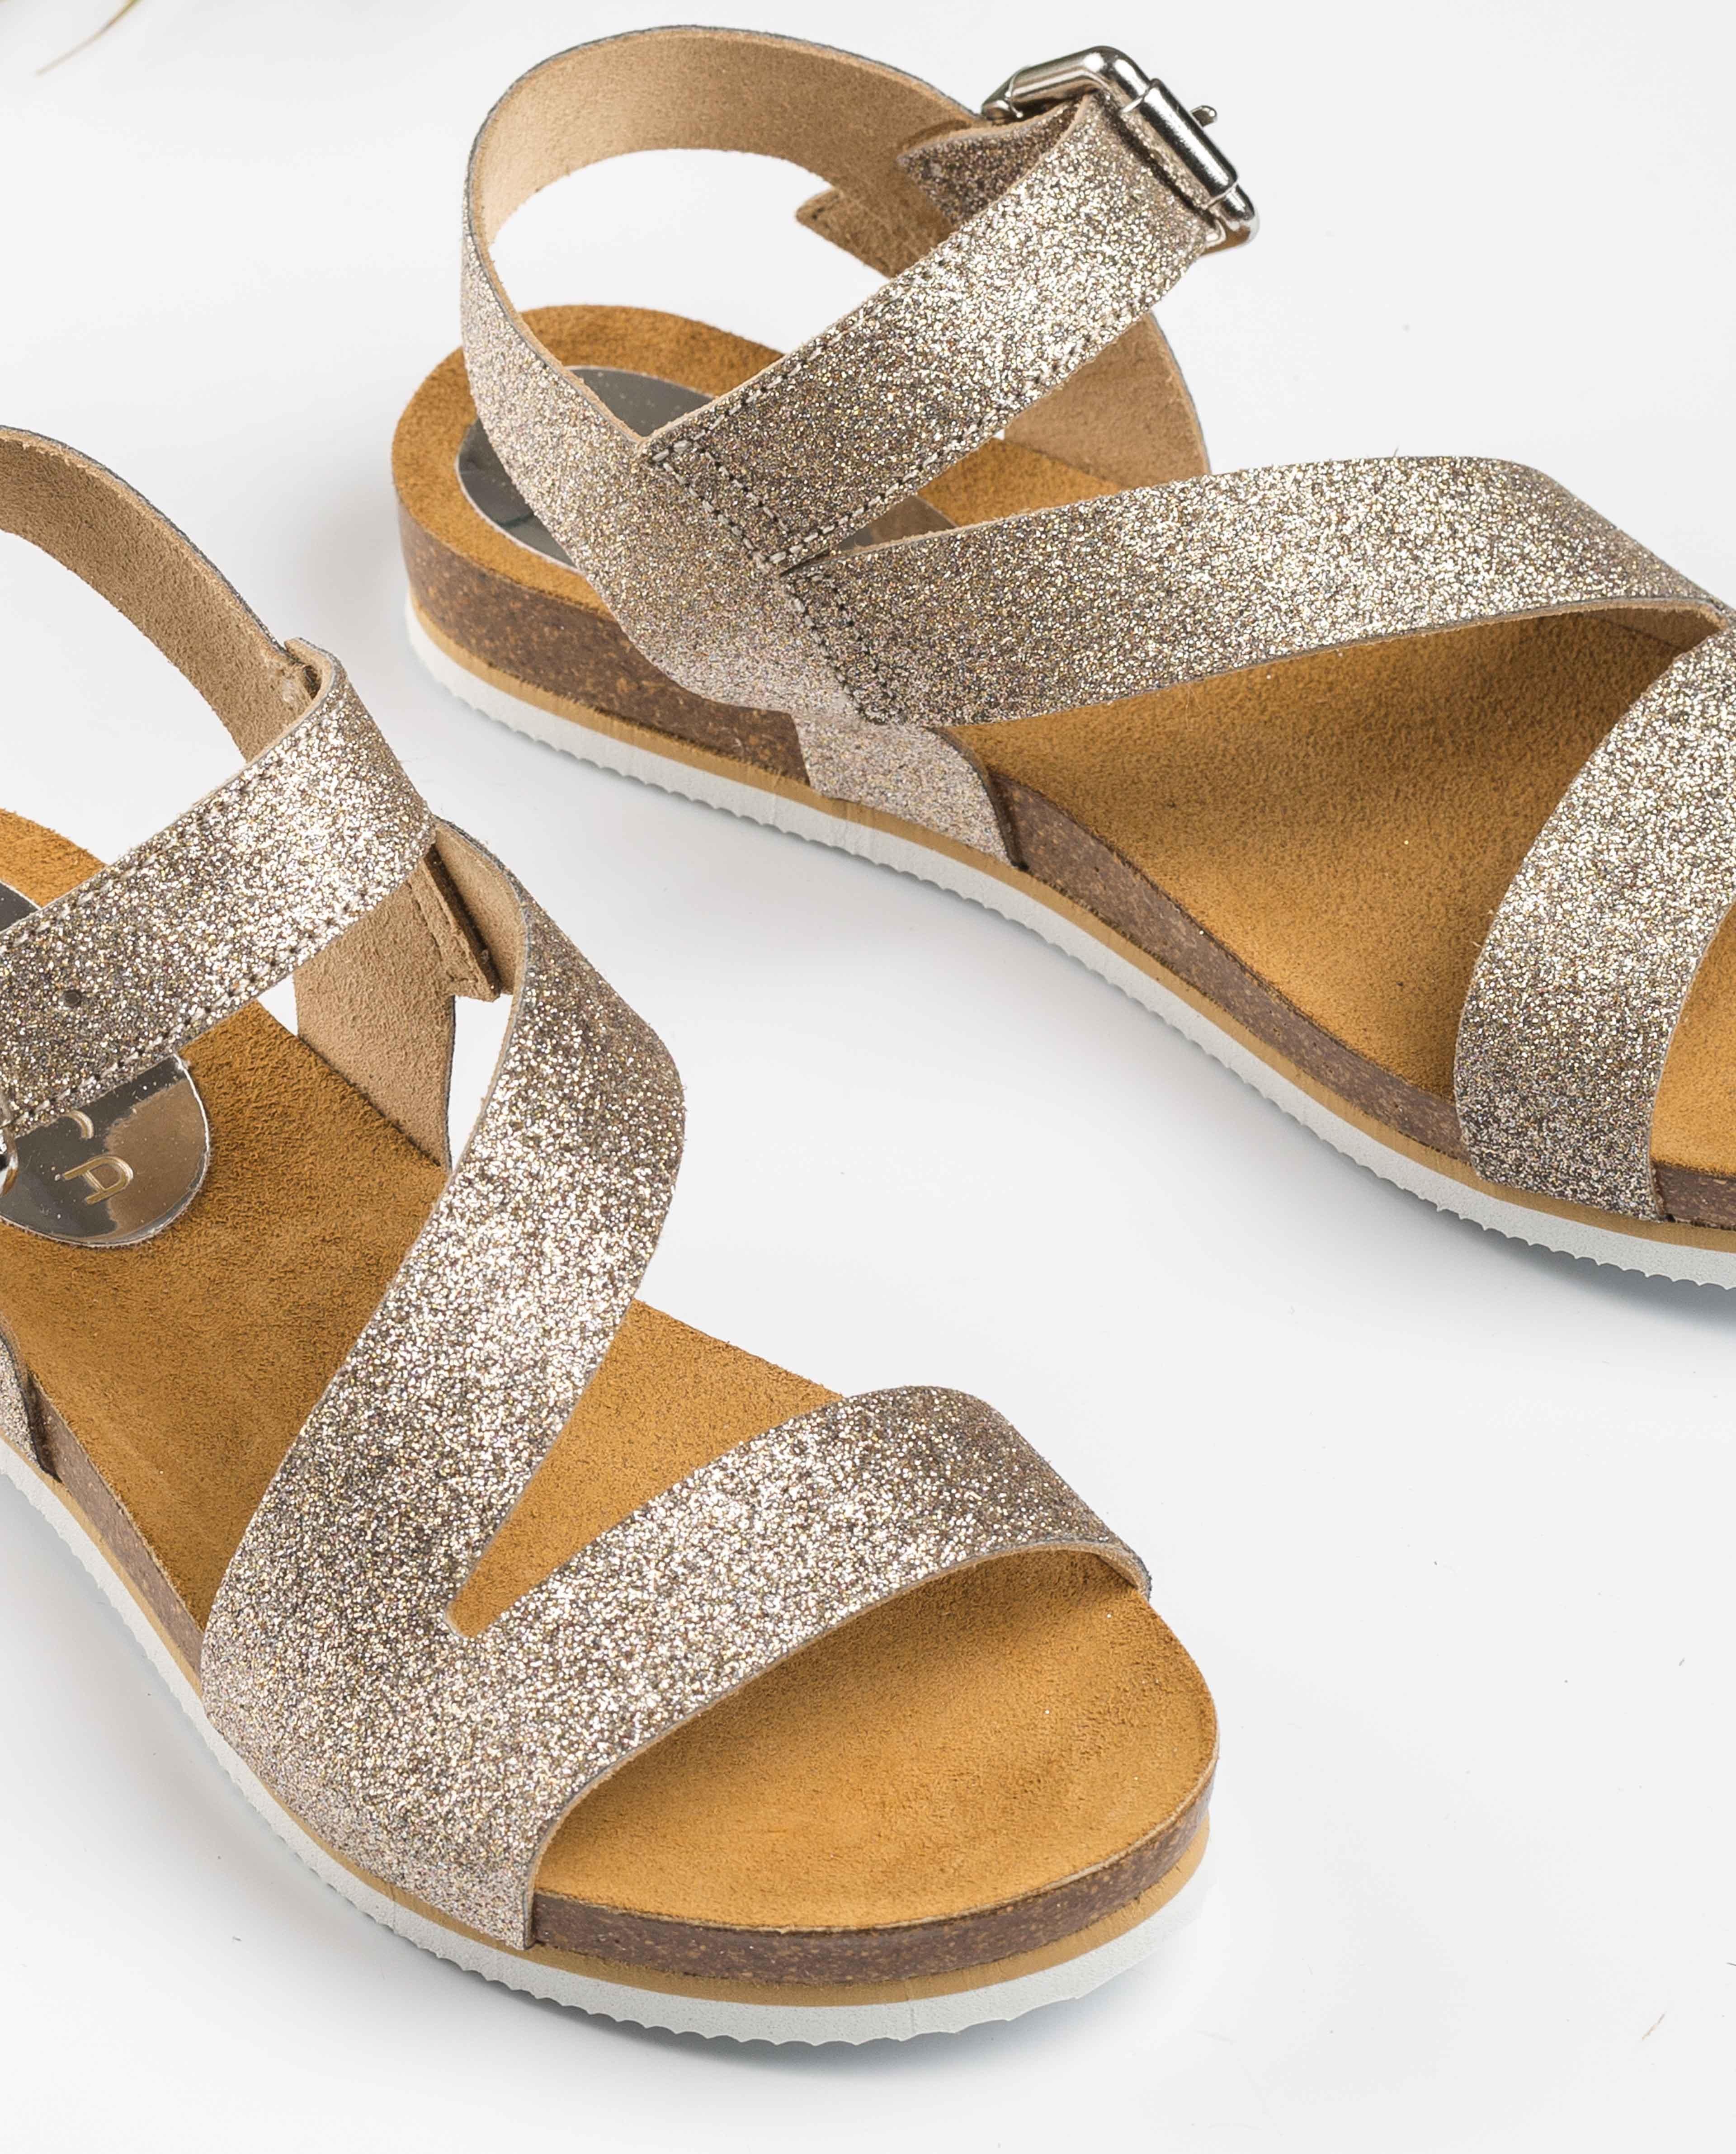 UNISA Bio-Sandalen mit Metallic-Effekt MAKENA_BRI mumm 5